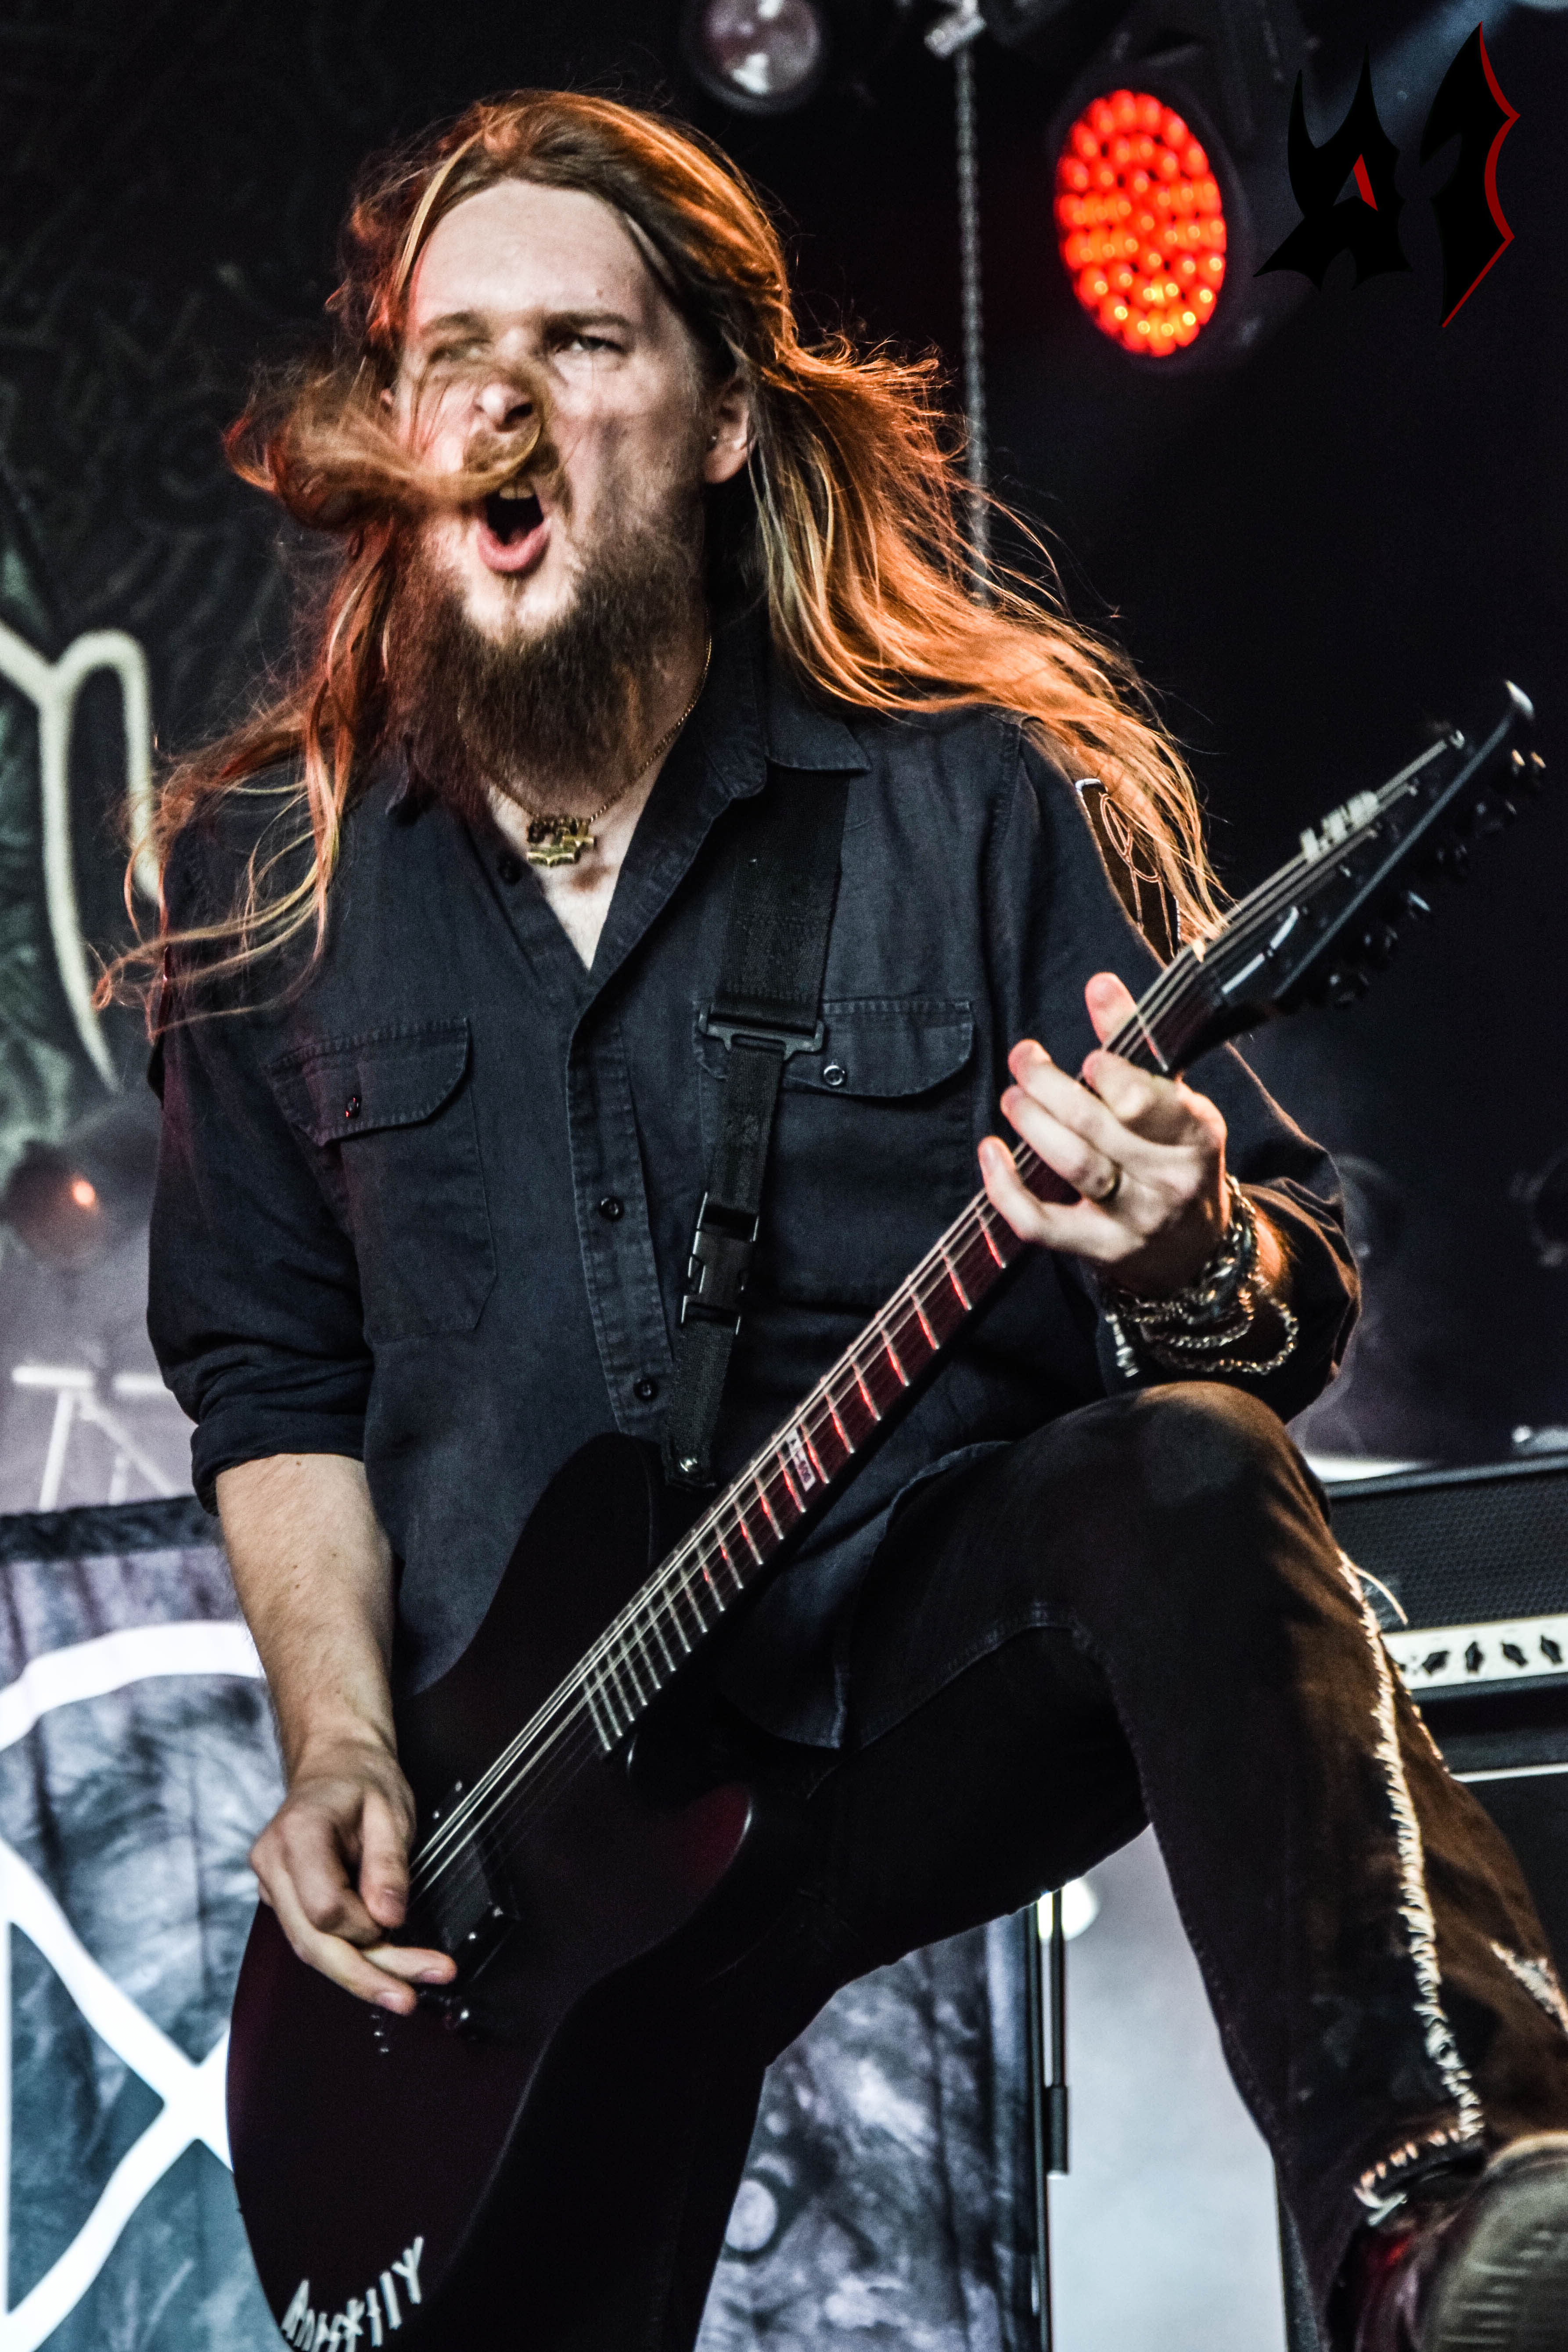 Hellfest 2018 – Day 3 - Manegarm 15